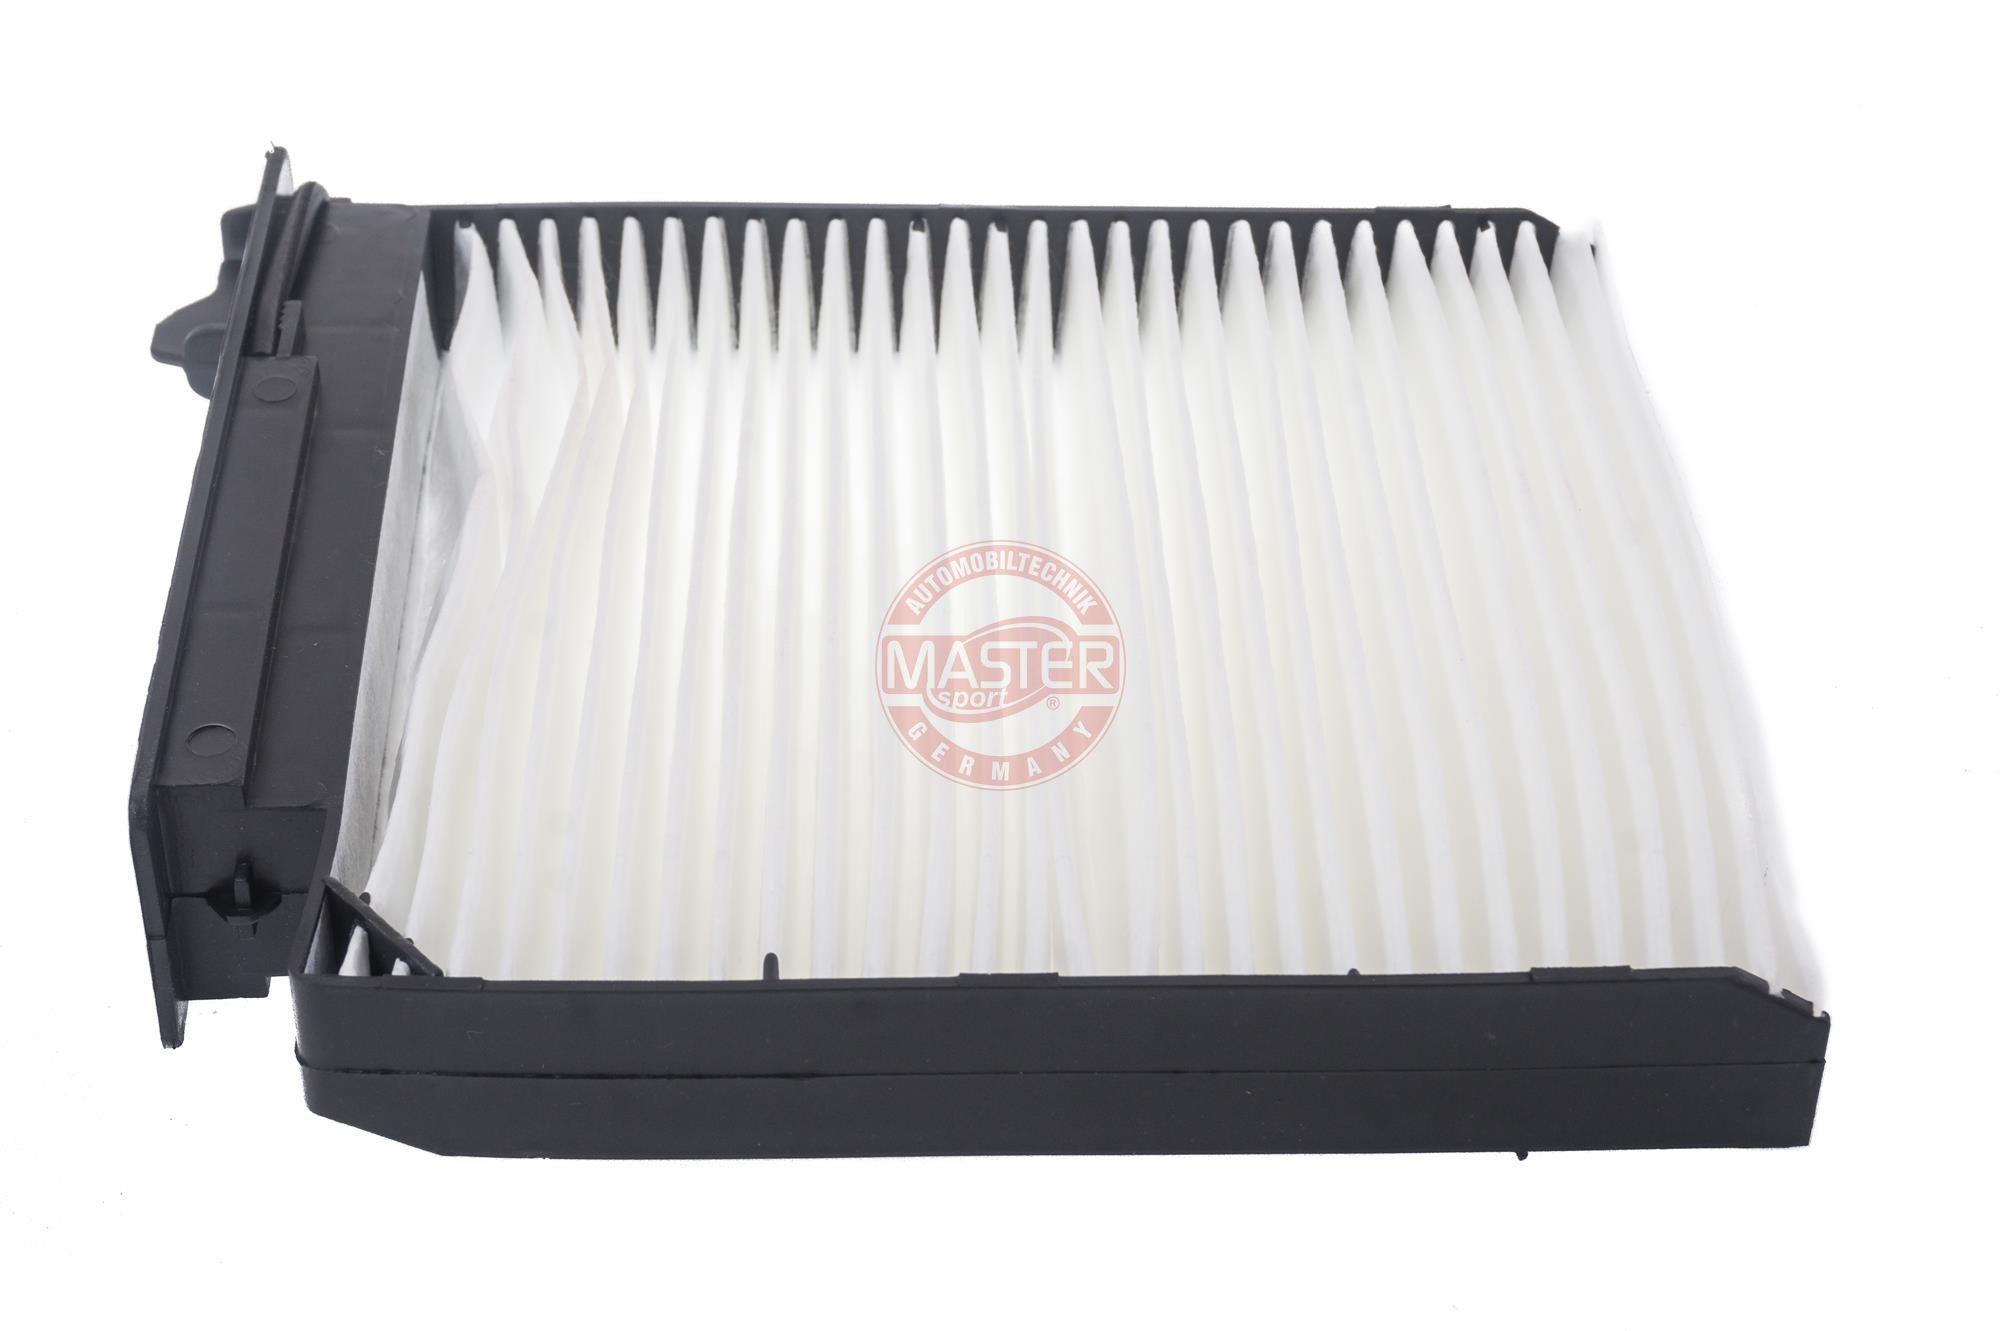 RENAULT TWINGO 2017 Kabinenluftfilter - Original MASTER-SPORT 1829-IF-PCS-MS Breite: 180mm, Höhe: 28mm, Länge: 185mm